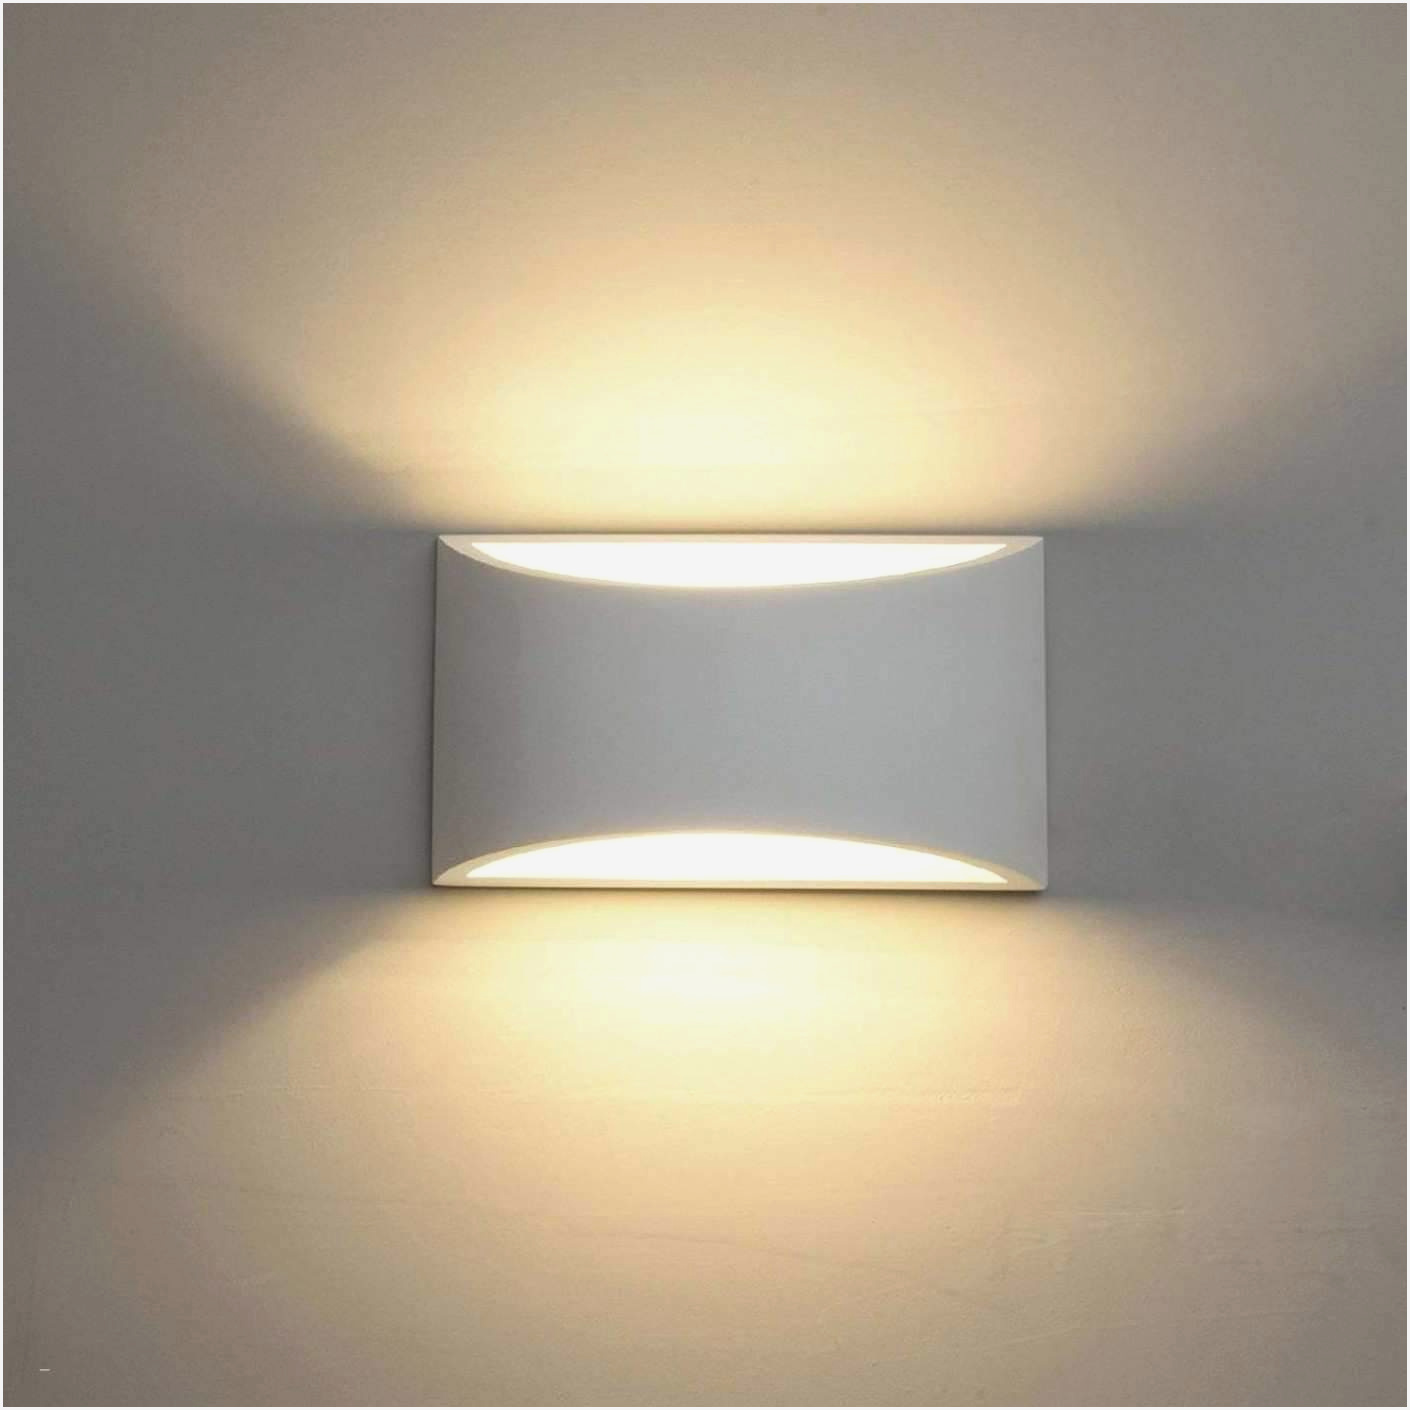 Full Size of Wohnzimmer Deckenlampe Led Dimmbar Traumhaus Landhausstil Fototapeten Bad Spiegelschrank Wandbilder Wandbild Teppiche Deckenleuchten Deckenlampen Dekoration Wohnzimmer Wohnzimmer Deckenlampe Led